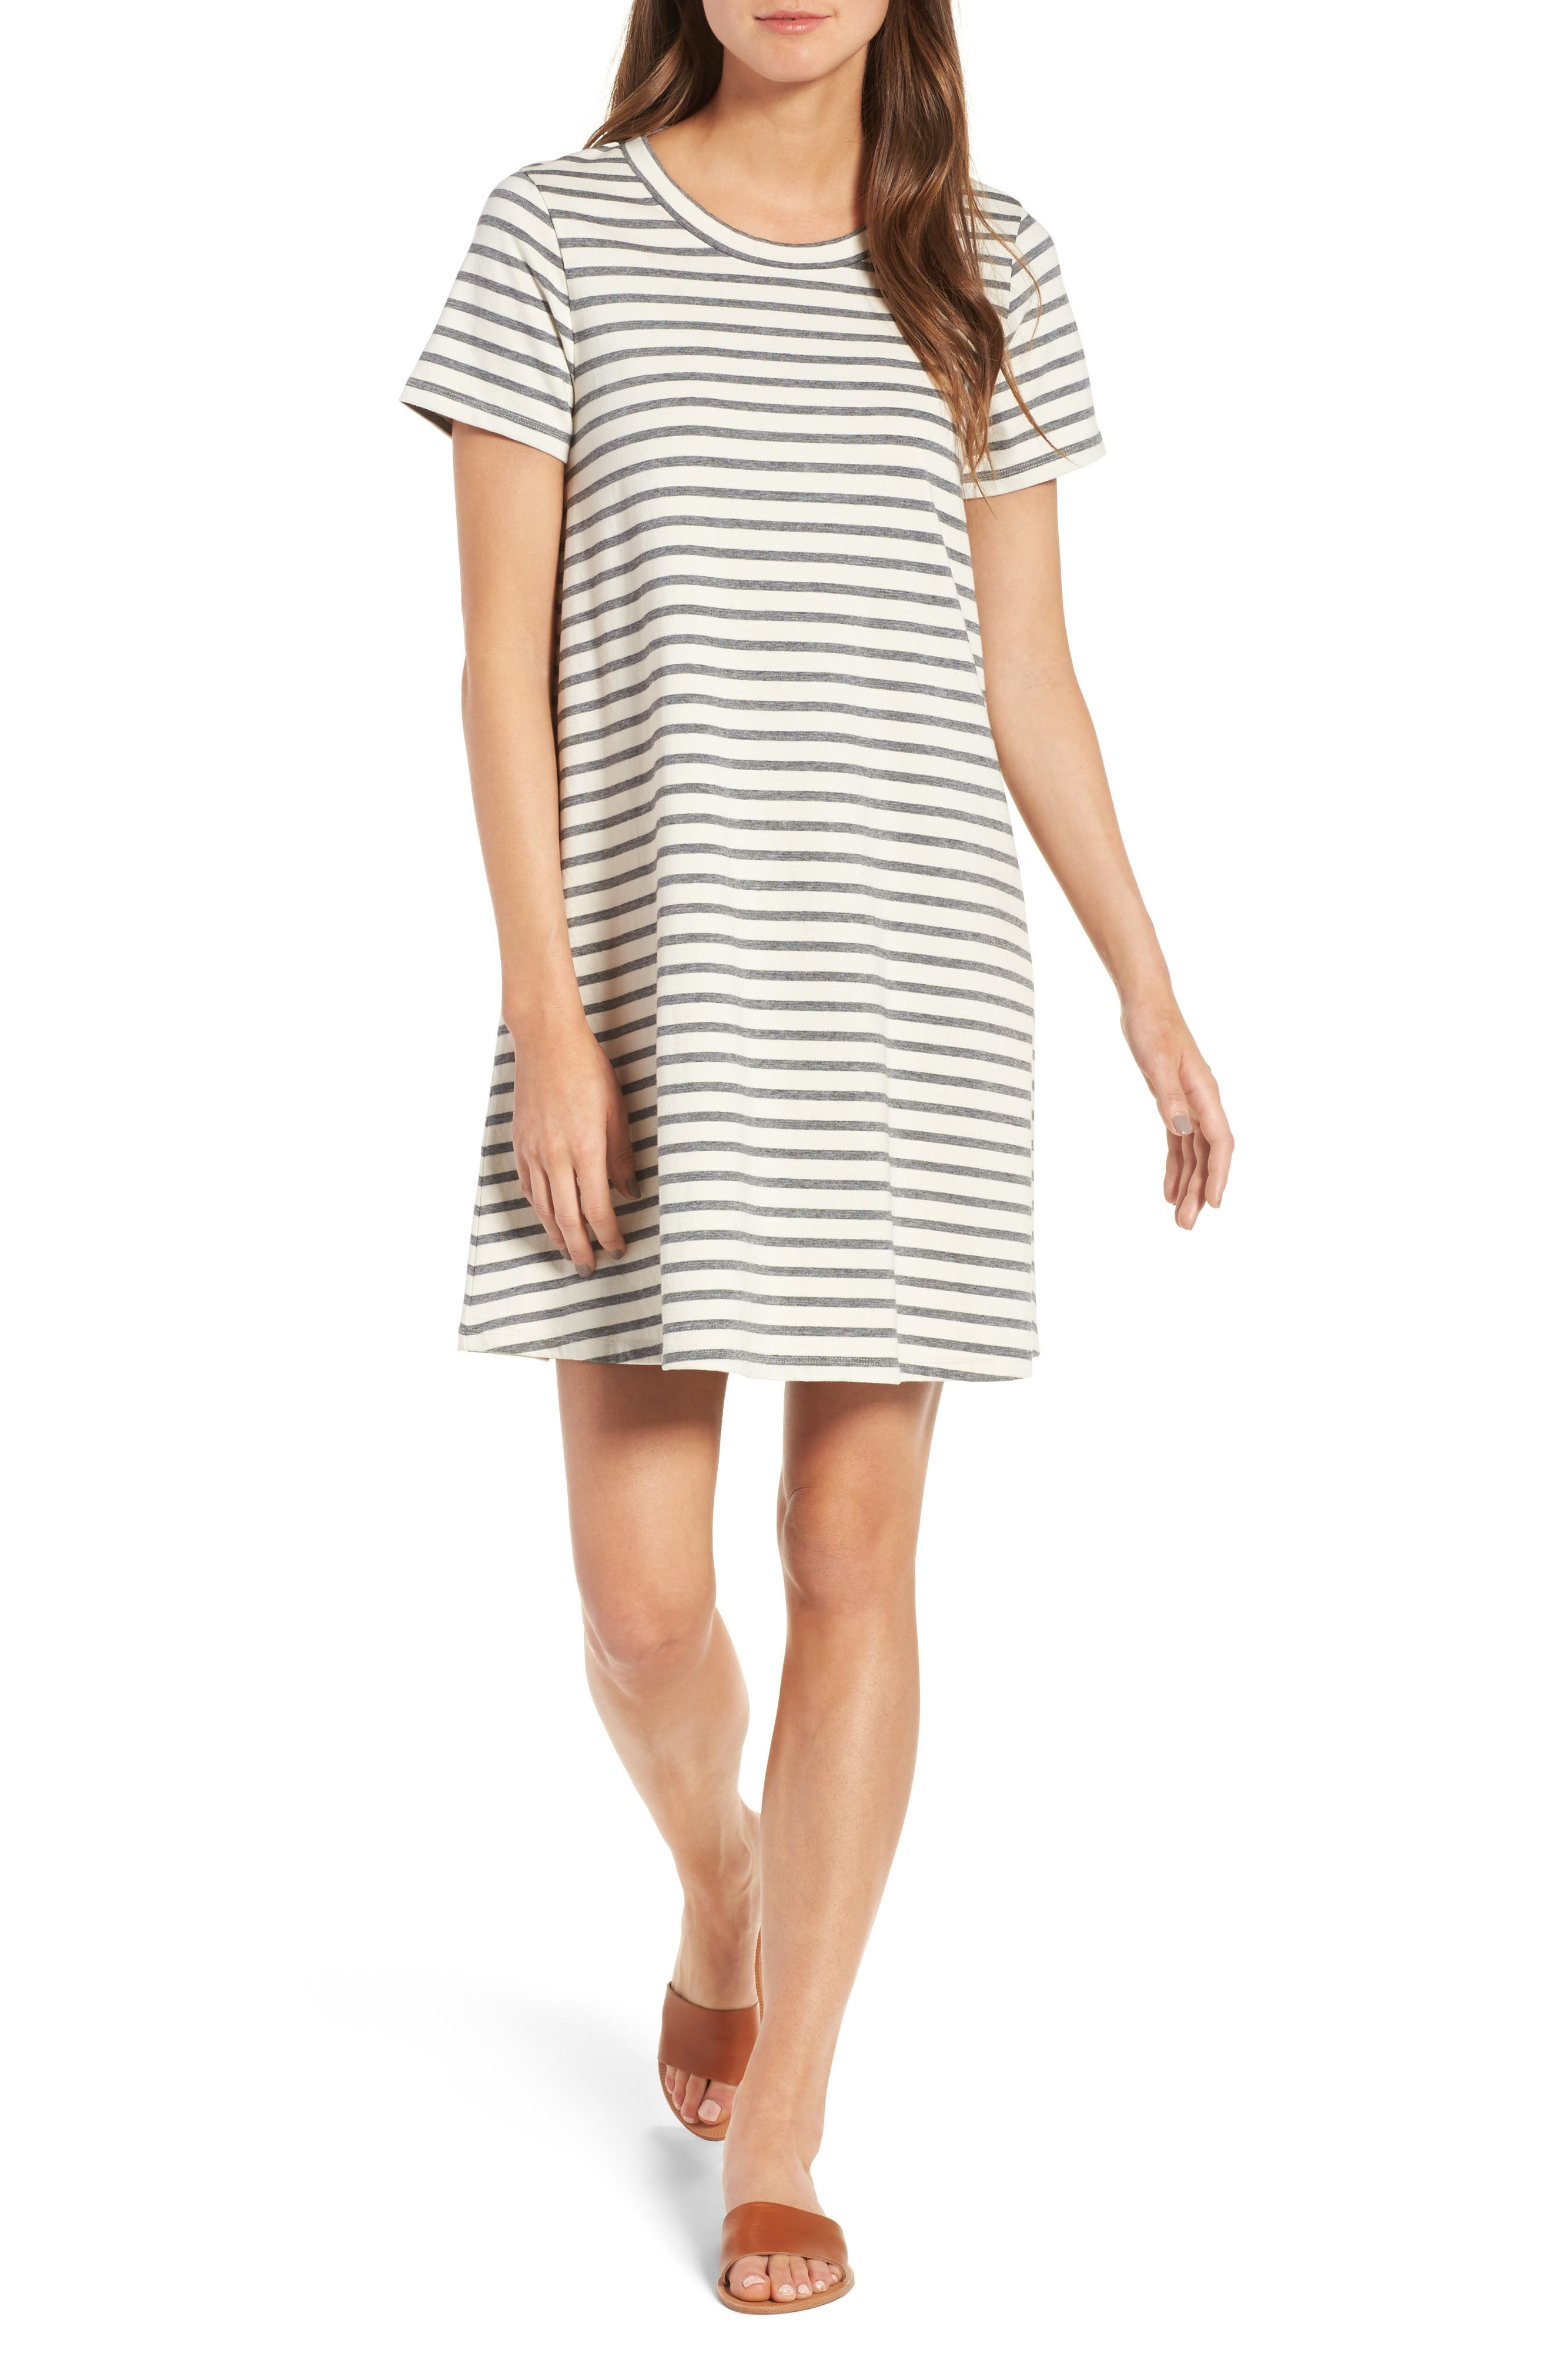 Alternate Image 1 Selected - Madewell Retreat Stripe Cotton Shift Dress